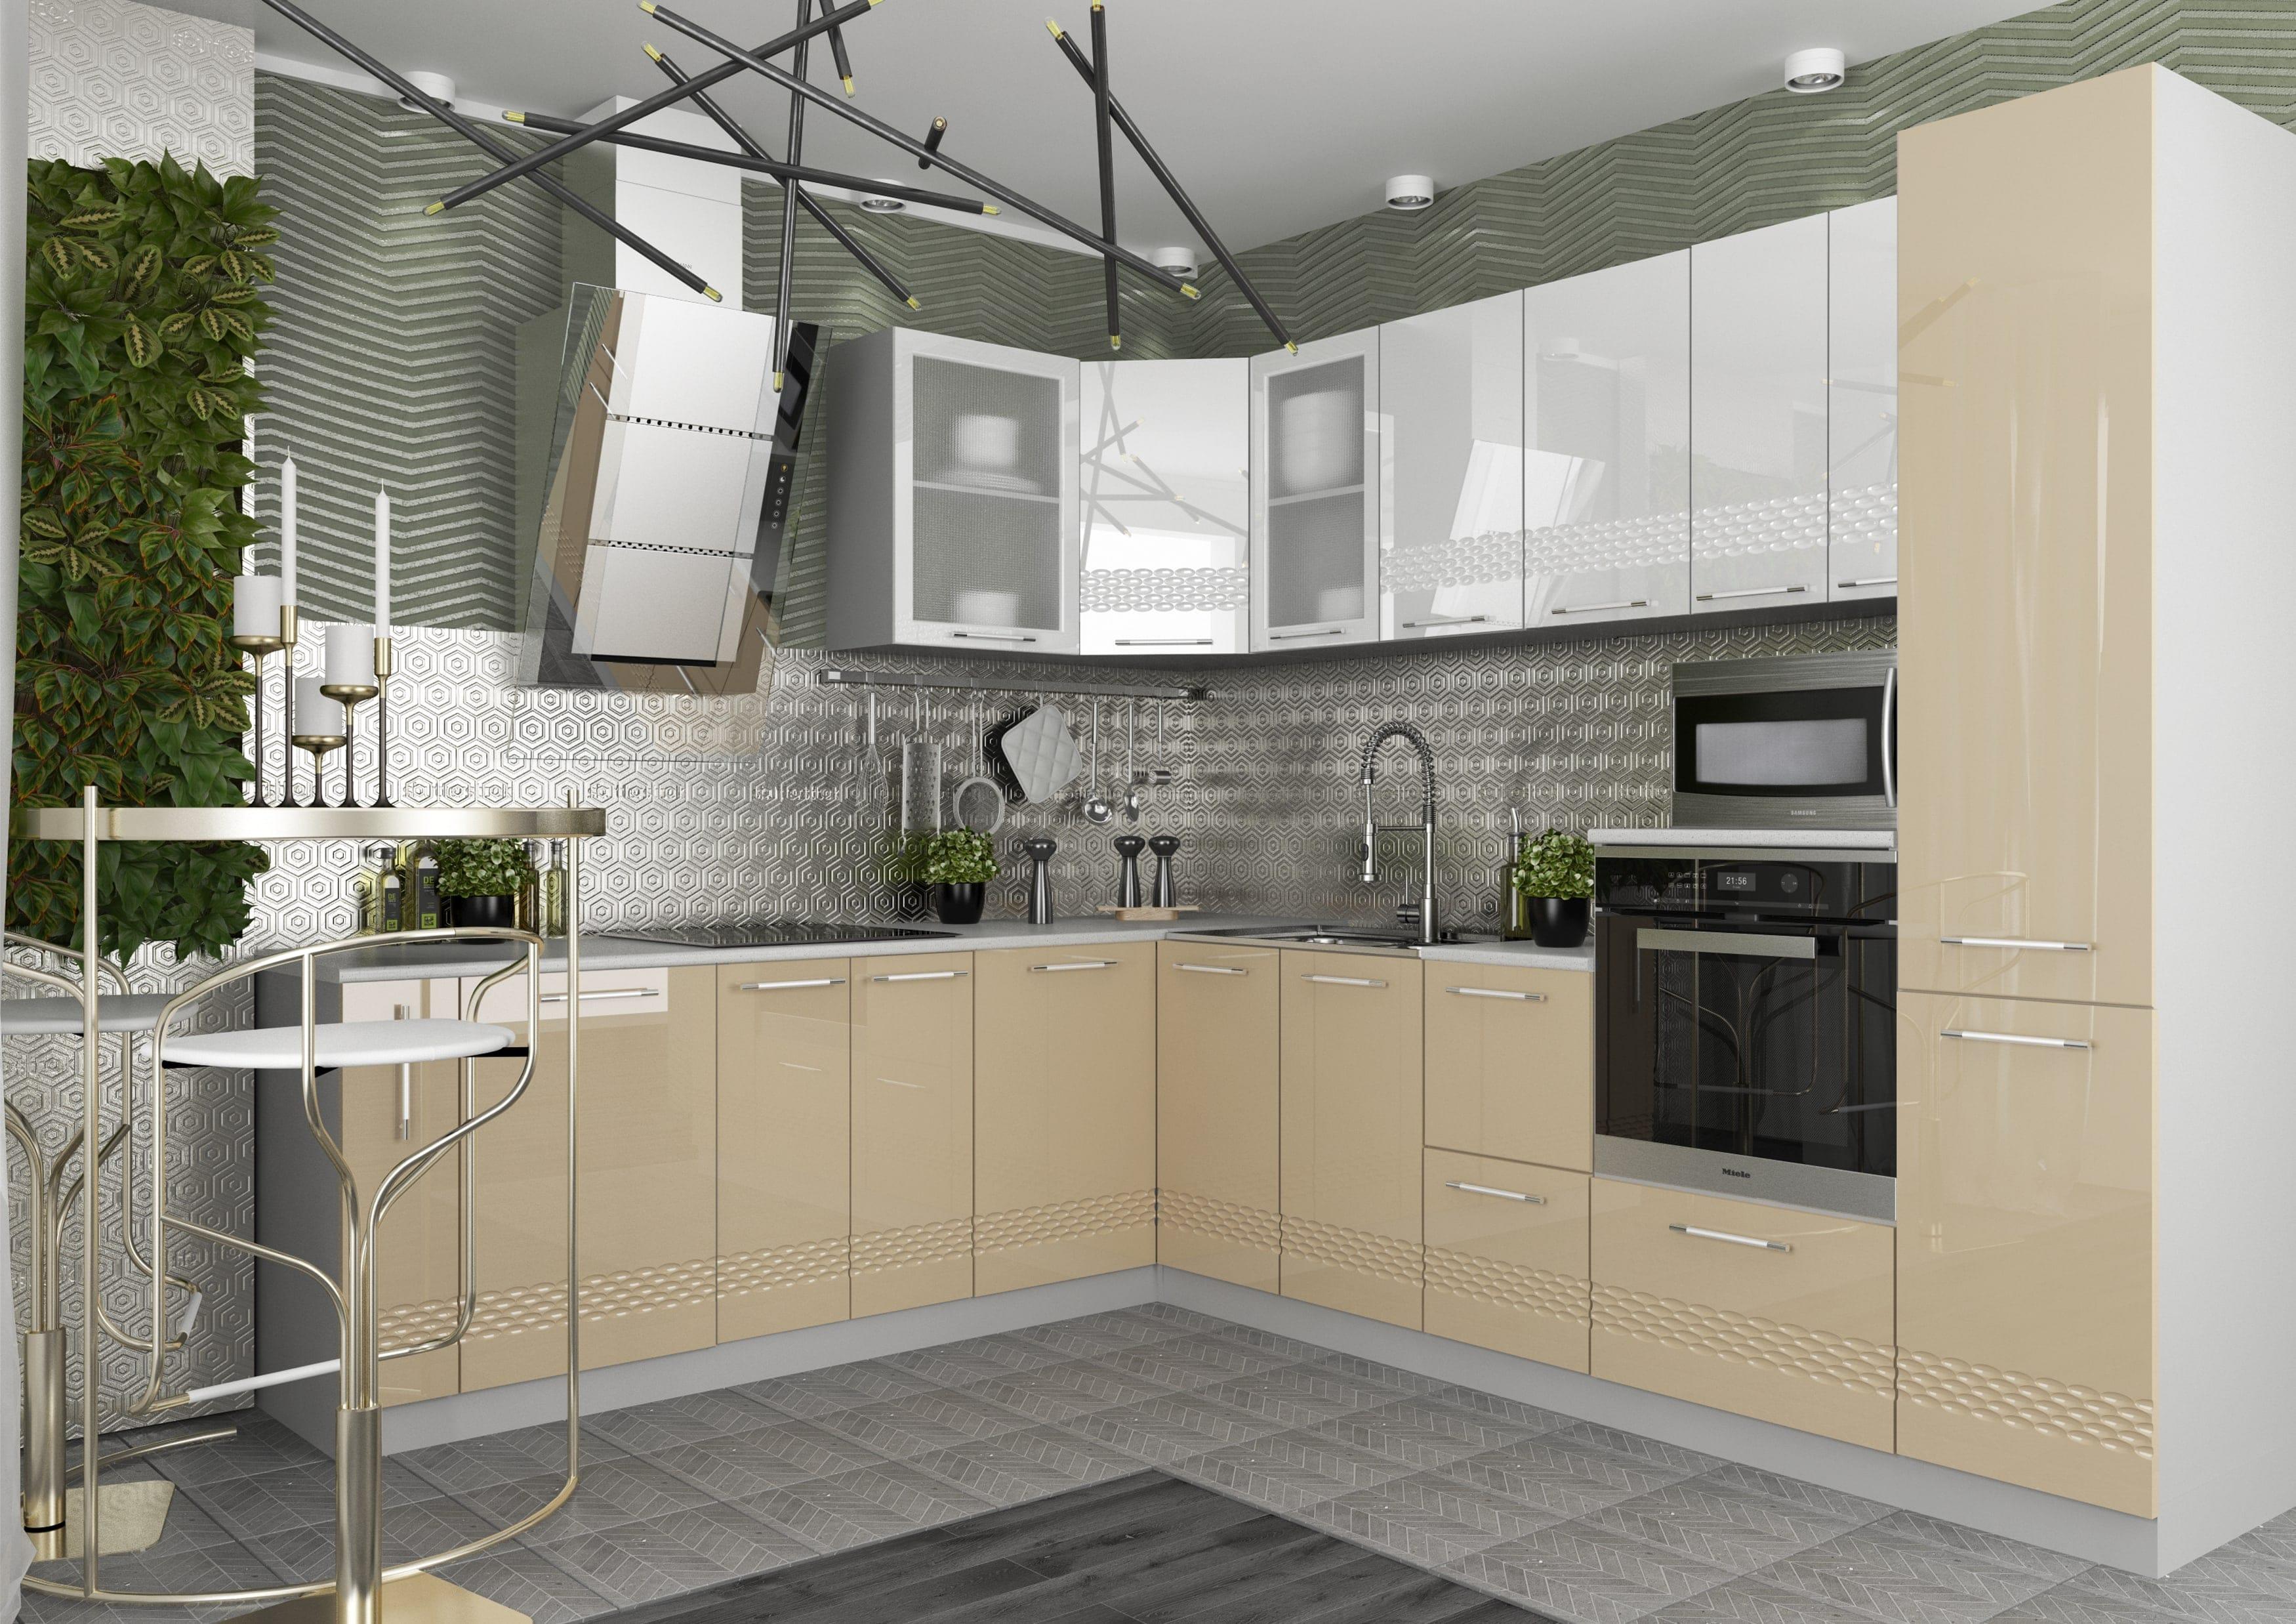 Кухня Капля 3D С 601 фасад под посудомйку